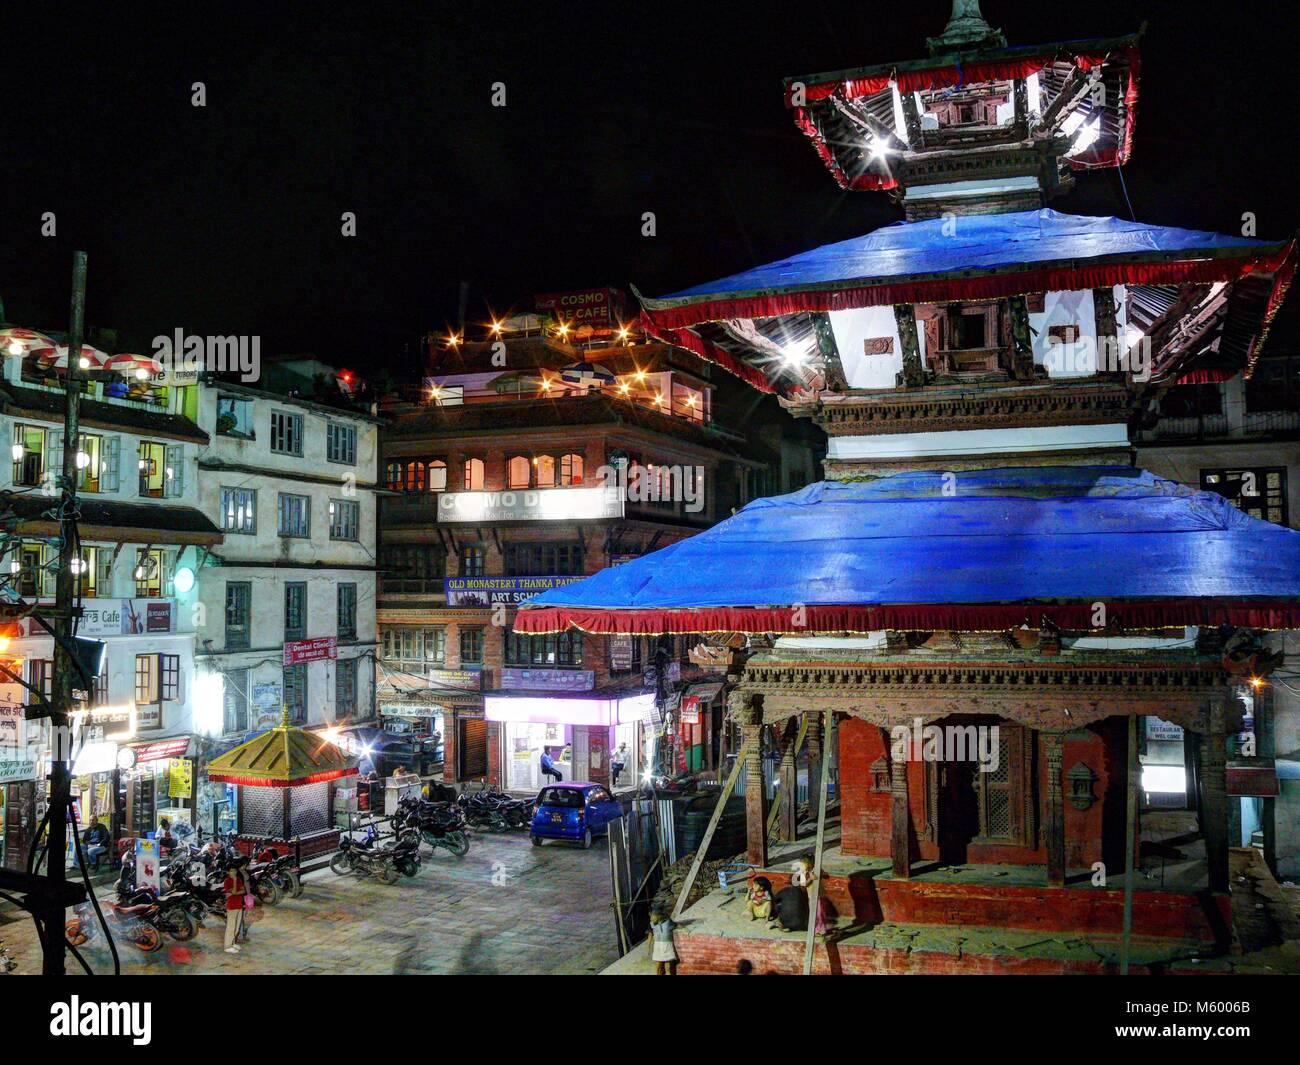 Durbar Square in Kathmandu, Nepal, october 4, 2013: Rush on the Kathmandu's Durbar Square at night - Stock Image